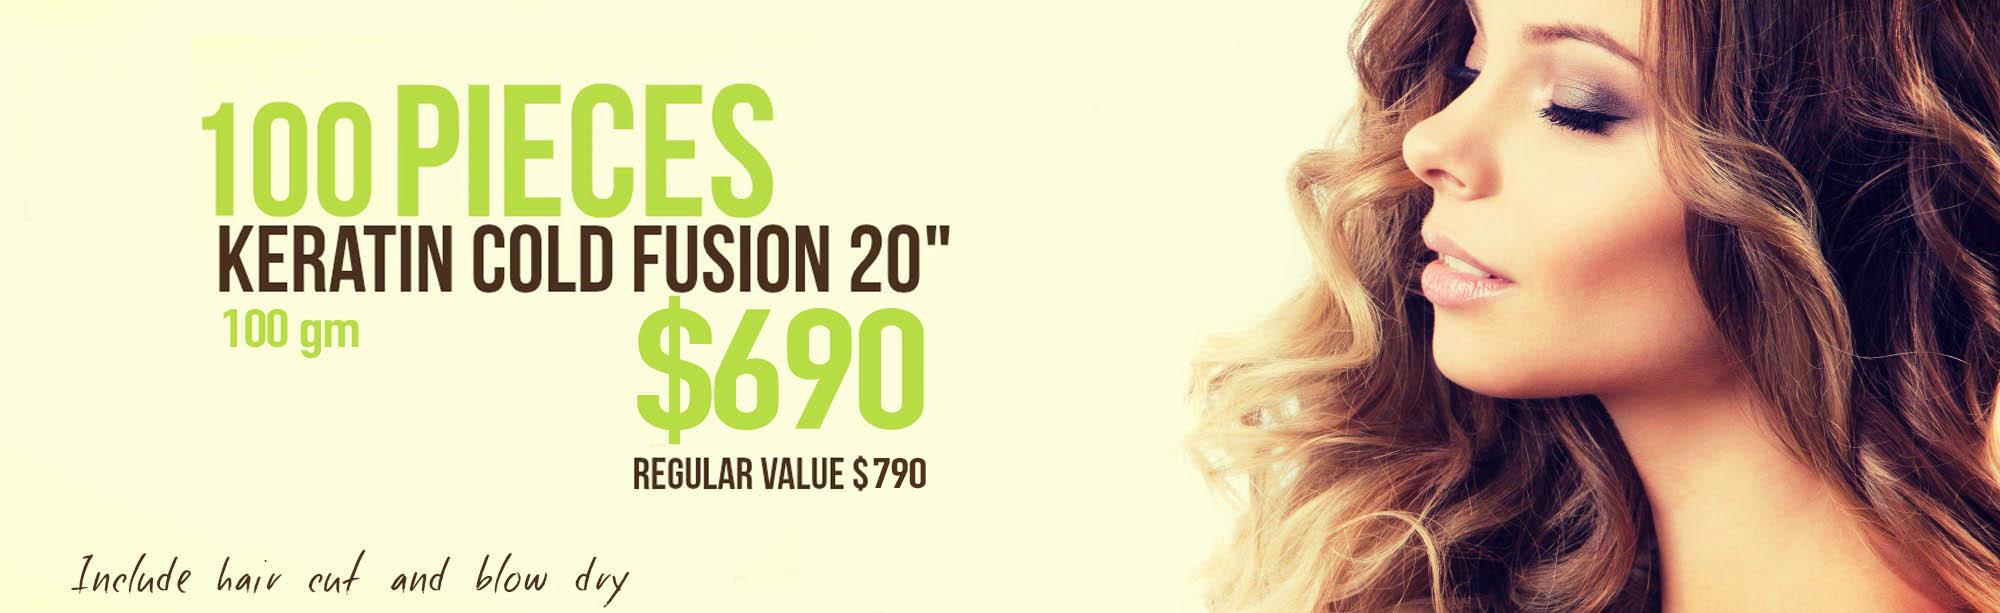 "Miami Hair Extensions Salon ,100 pieces keratin cold fusion 20"",Include hair cut  blow dry, kit argan oil"